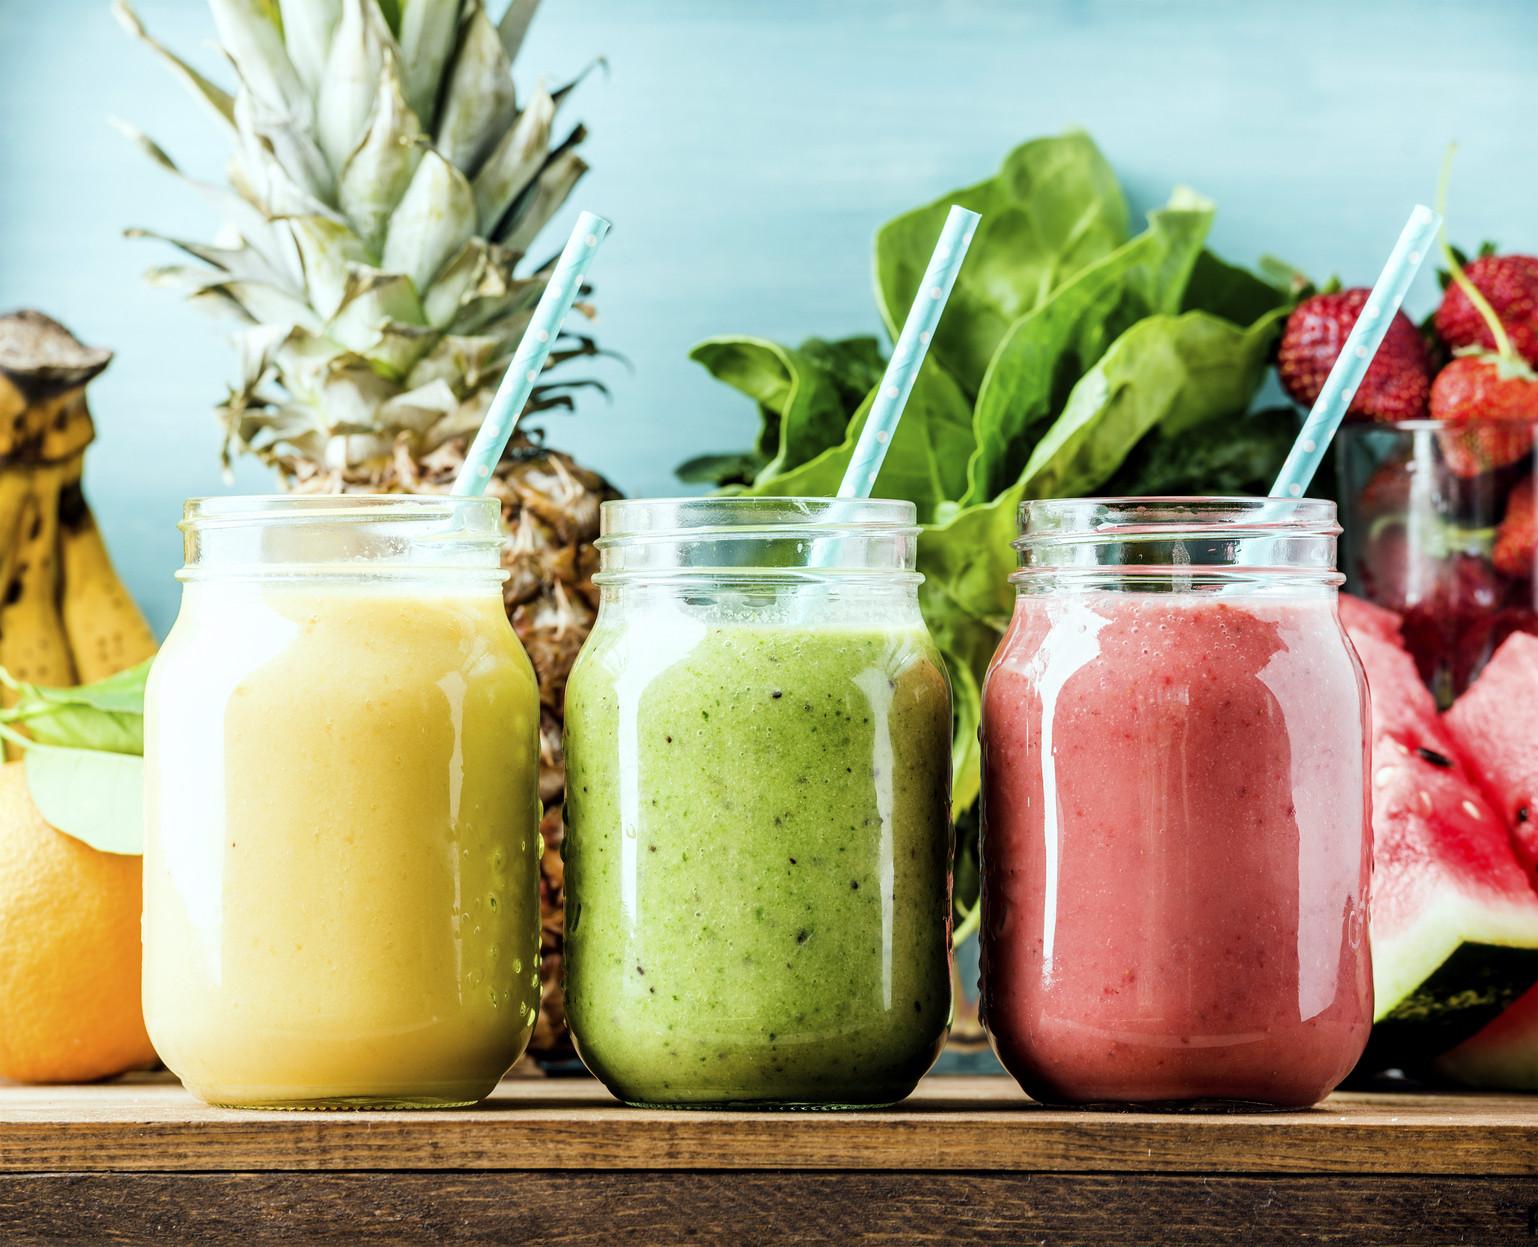 Healthy Juice Smoothies  Are fresh juice drinks as healthy as they seem Harvard